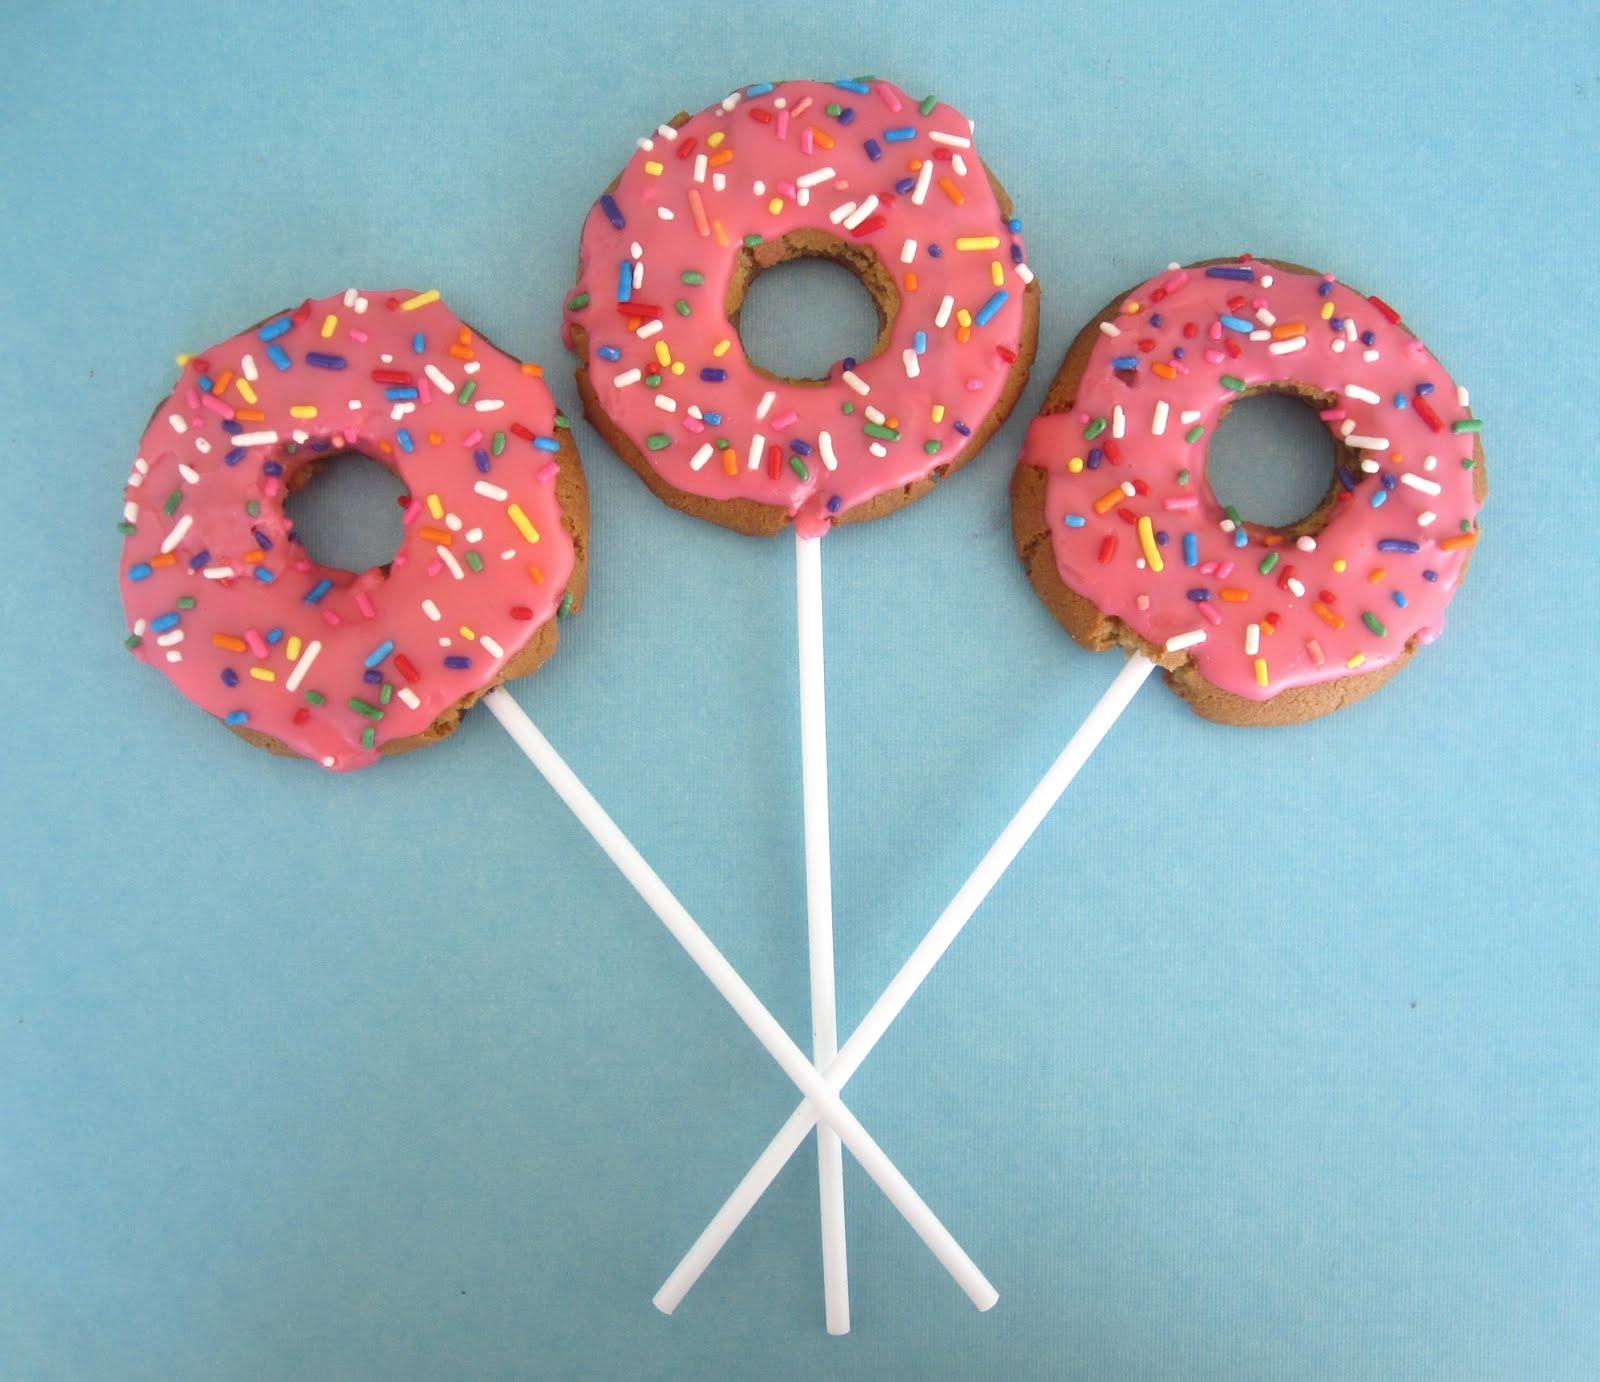 Donut Cookie Pops Lindsay Ann Bakes Watermelon Wallpaper Rainbow Find Free HD for Desktop [freshlhys.tk]